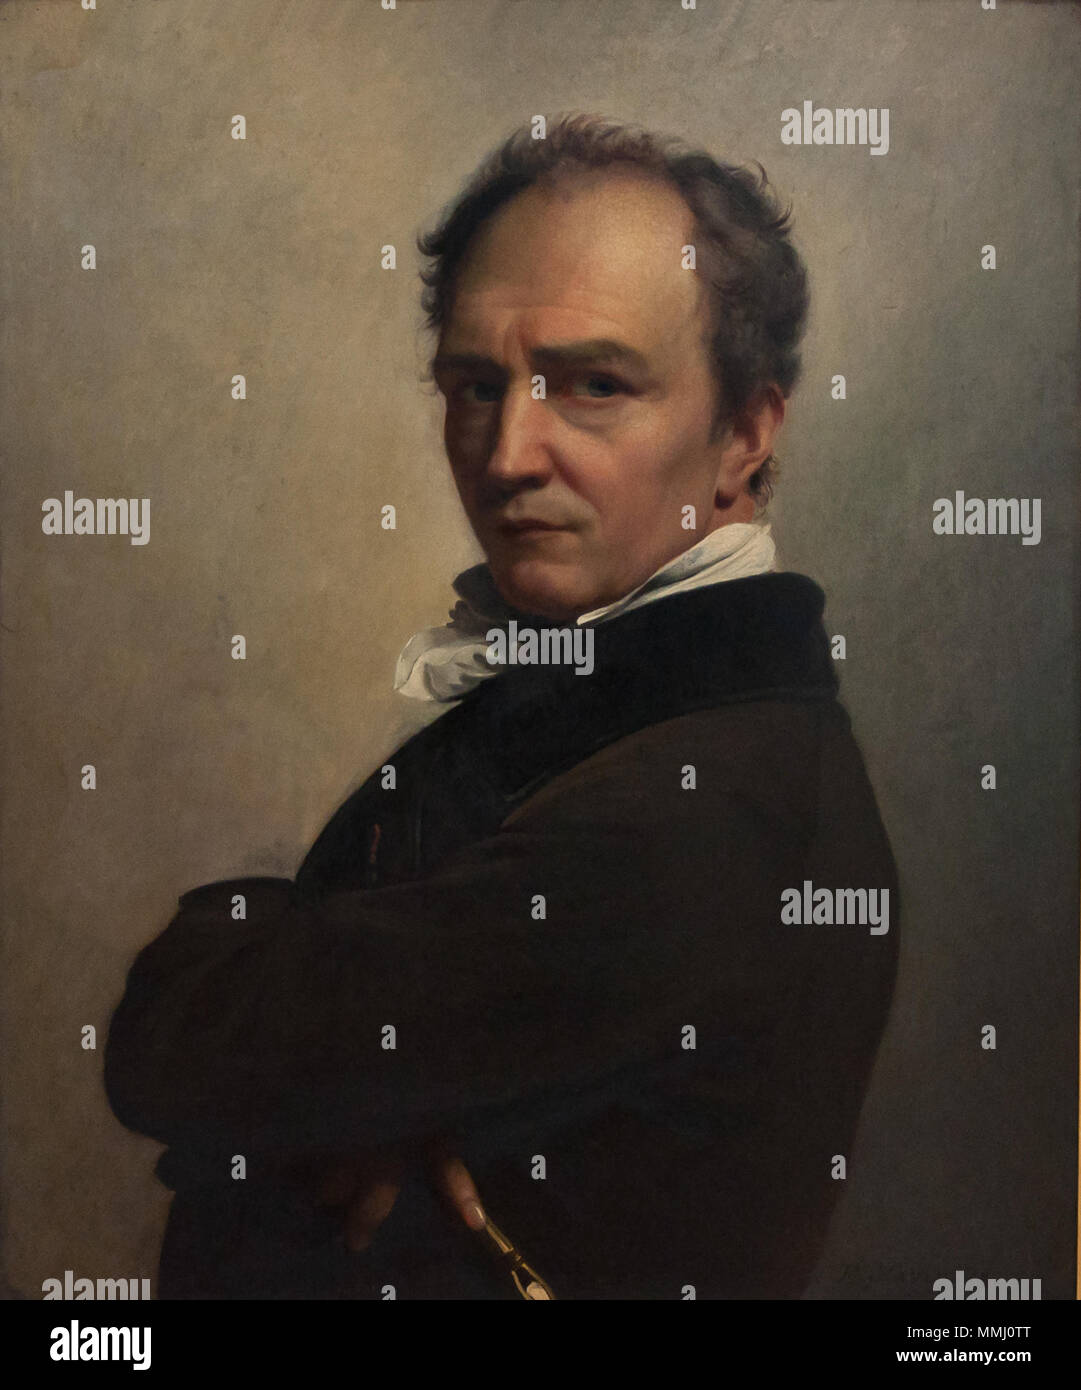 François-Joseph Navez (1787-1869) - Zelfportret (1826) - KMSK Brussel 25-02-2011 13-16-16 25-02-2011 14-16-16 Stock Photo